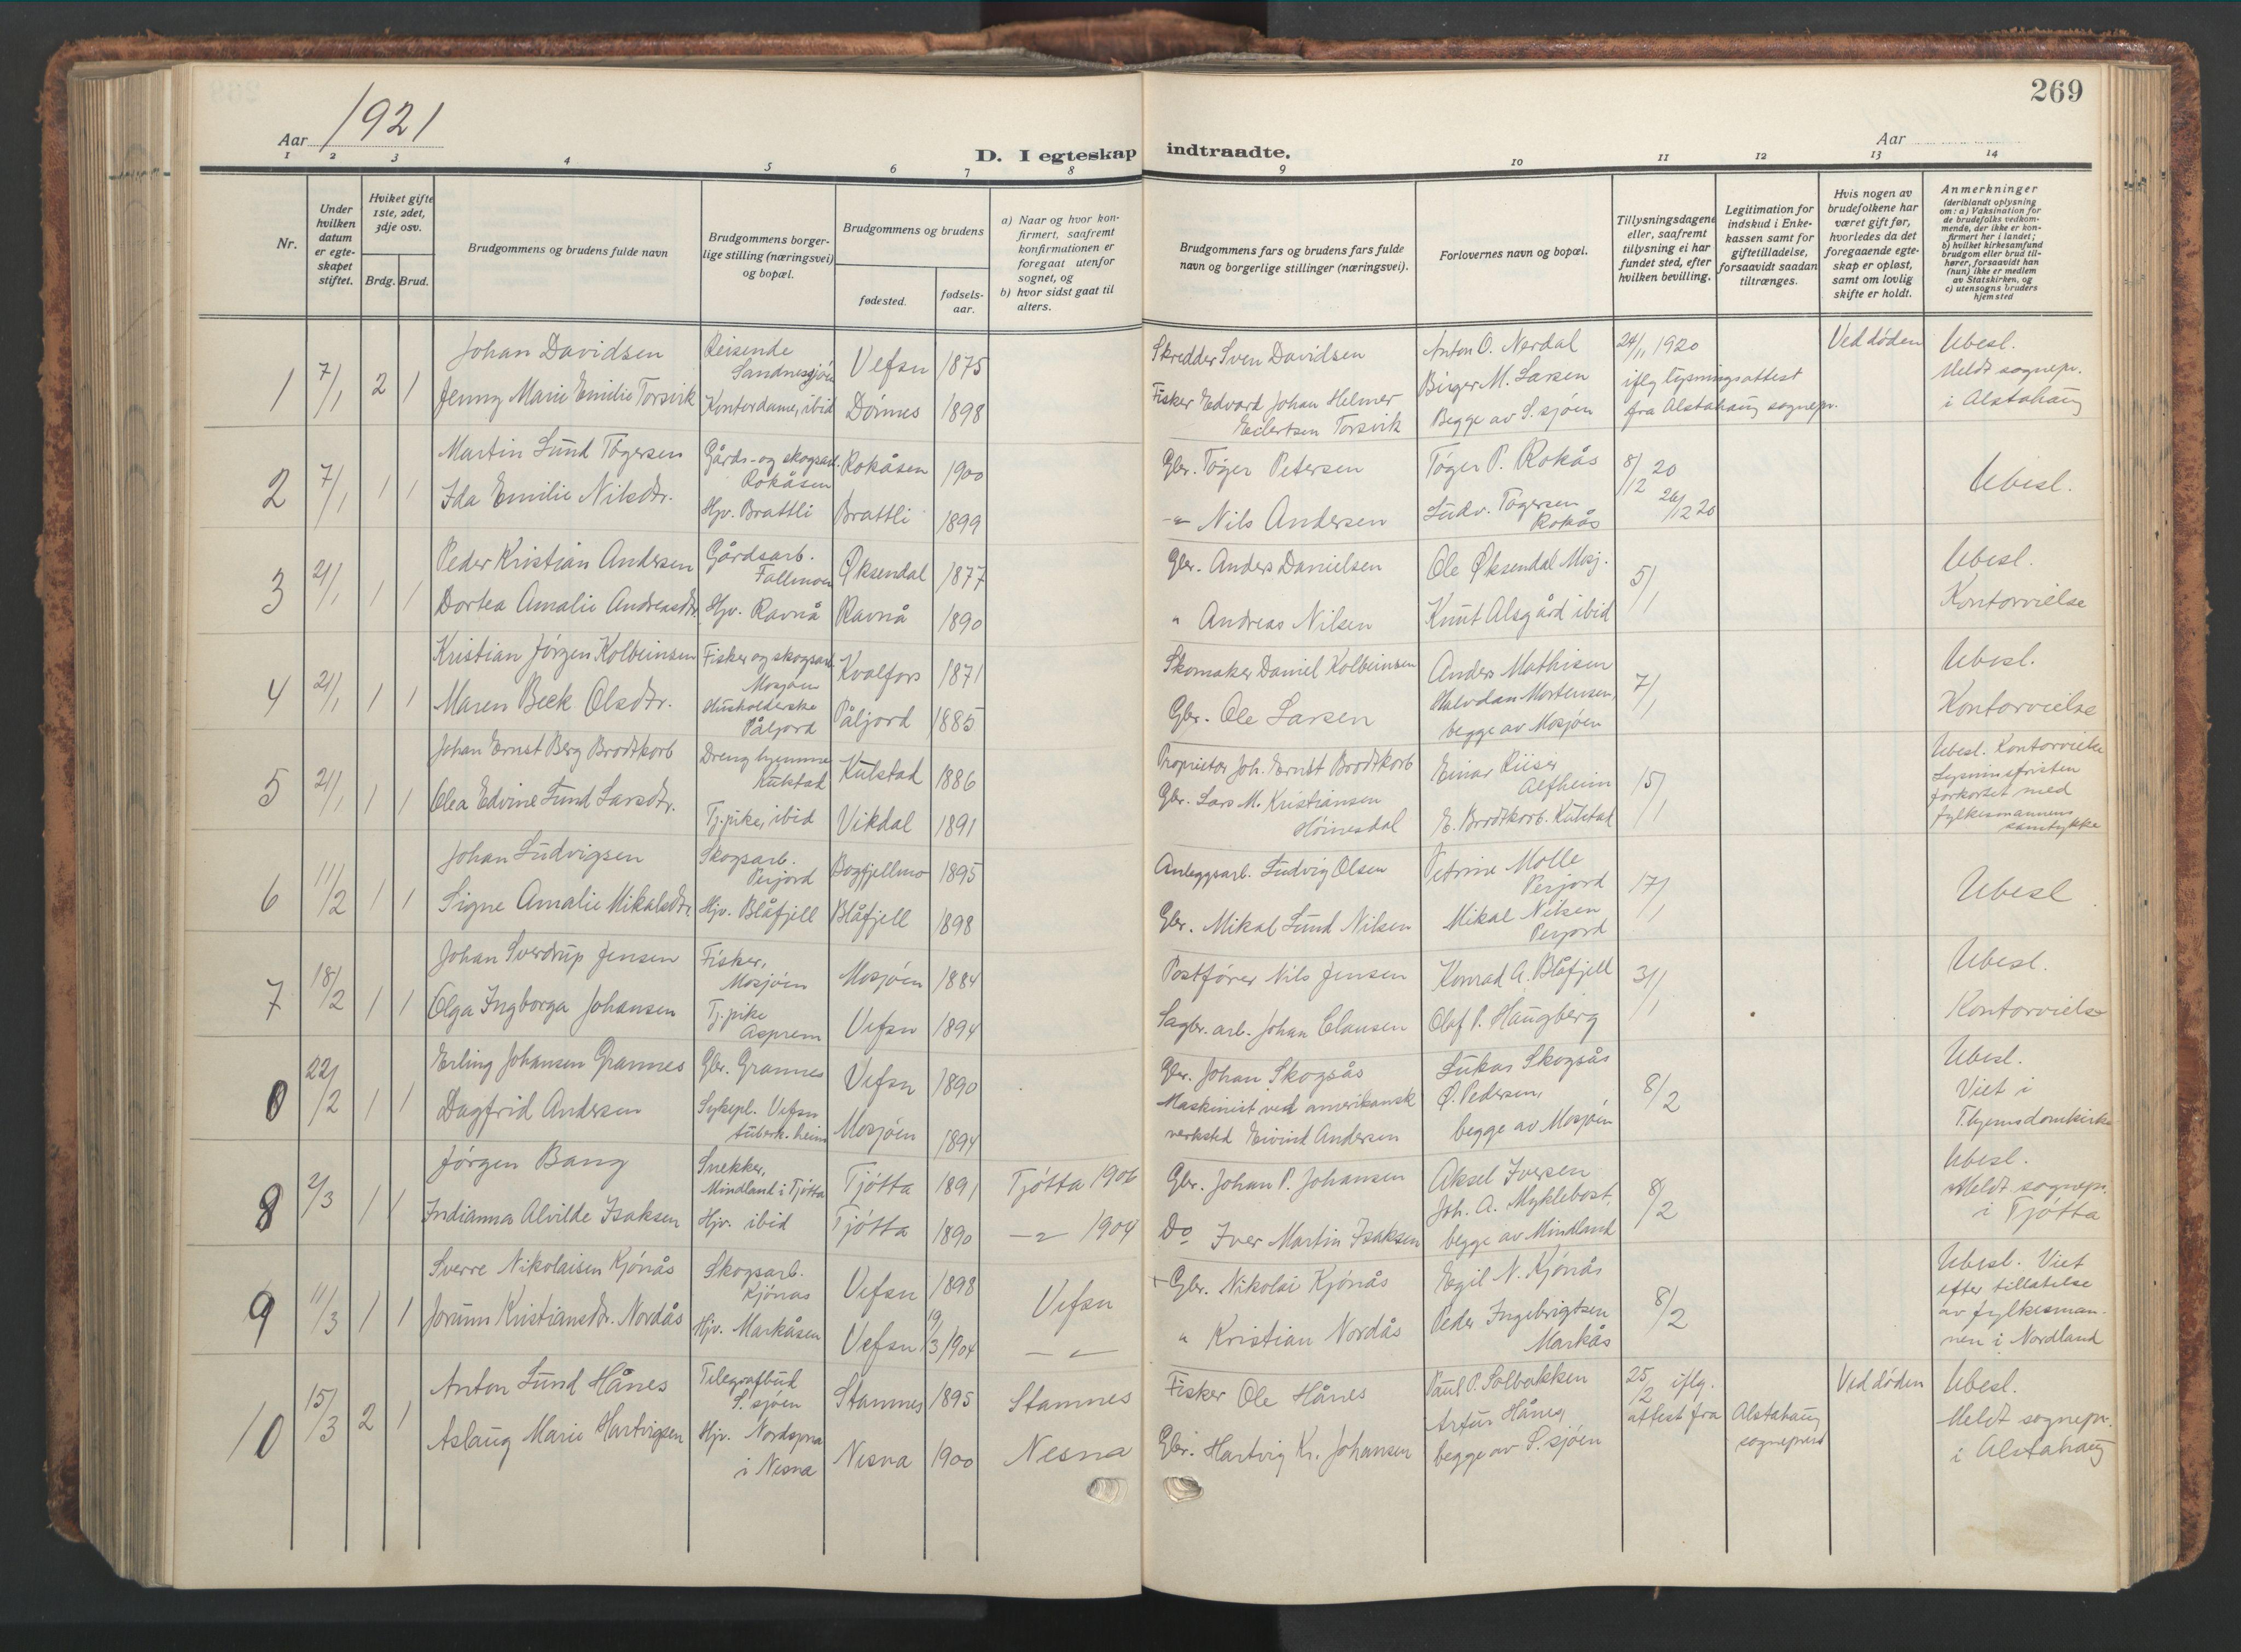 SAT, Ministerialprotokoller, klokkerbøker og fødselsregistre - Nordland, 820/L0302: Klokkerbok nr. 820C04, 1917-1948, s. 269